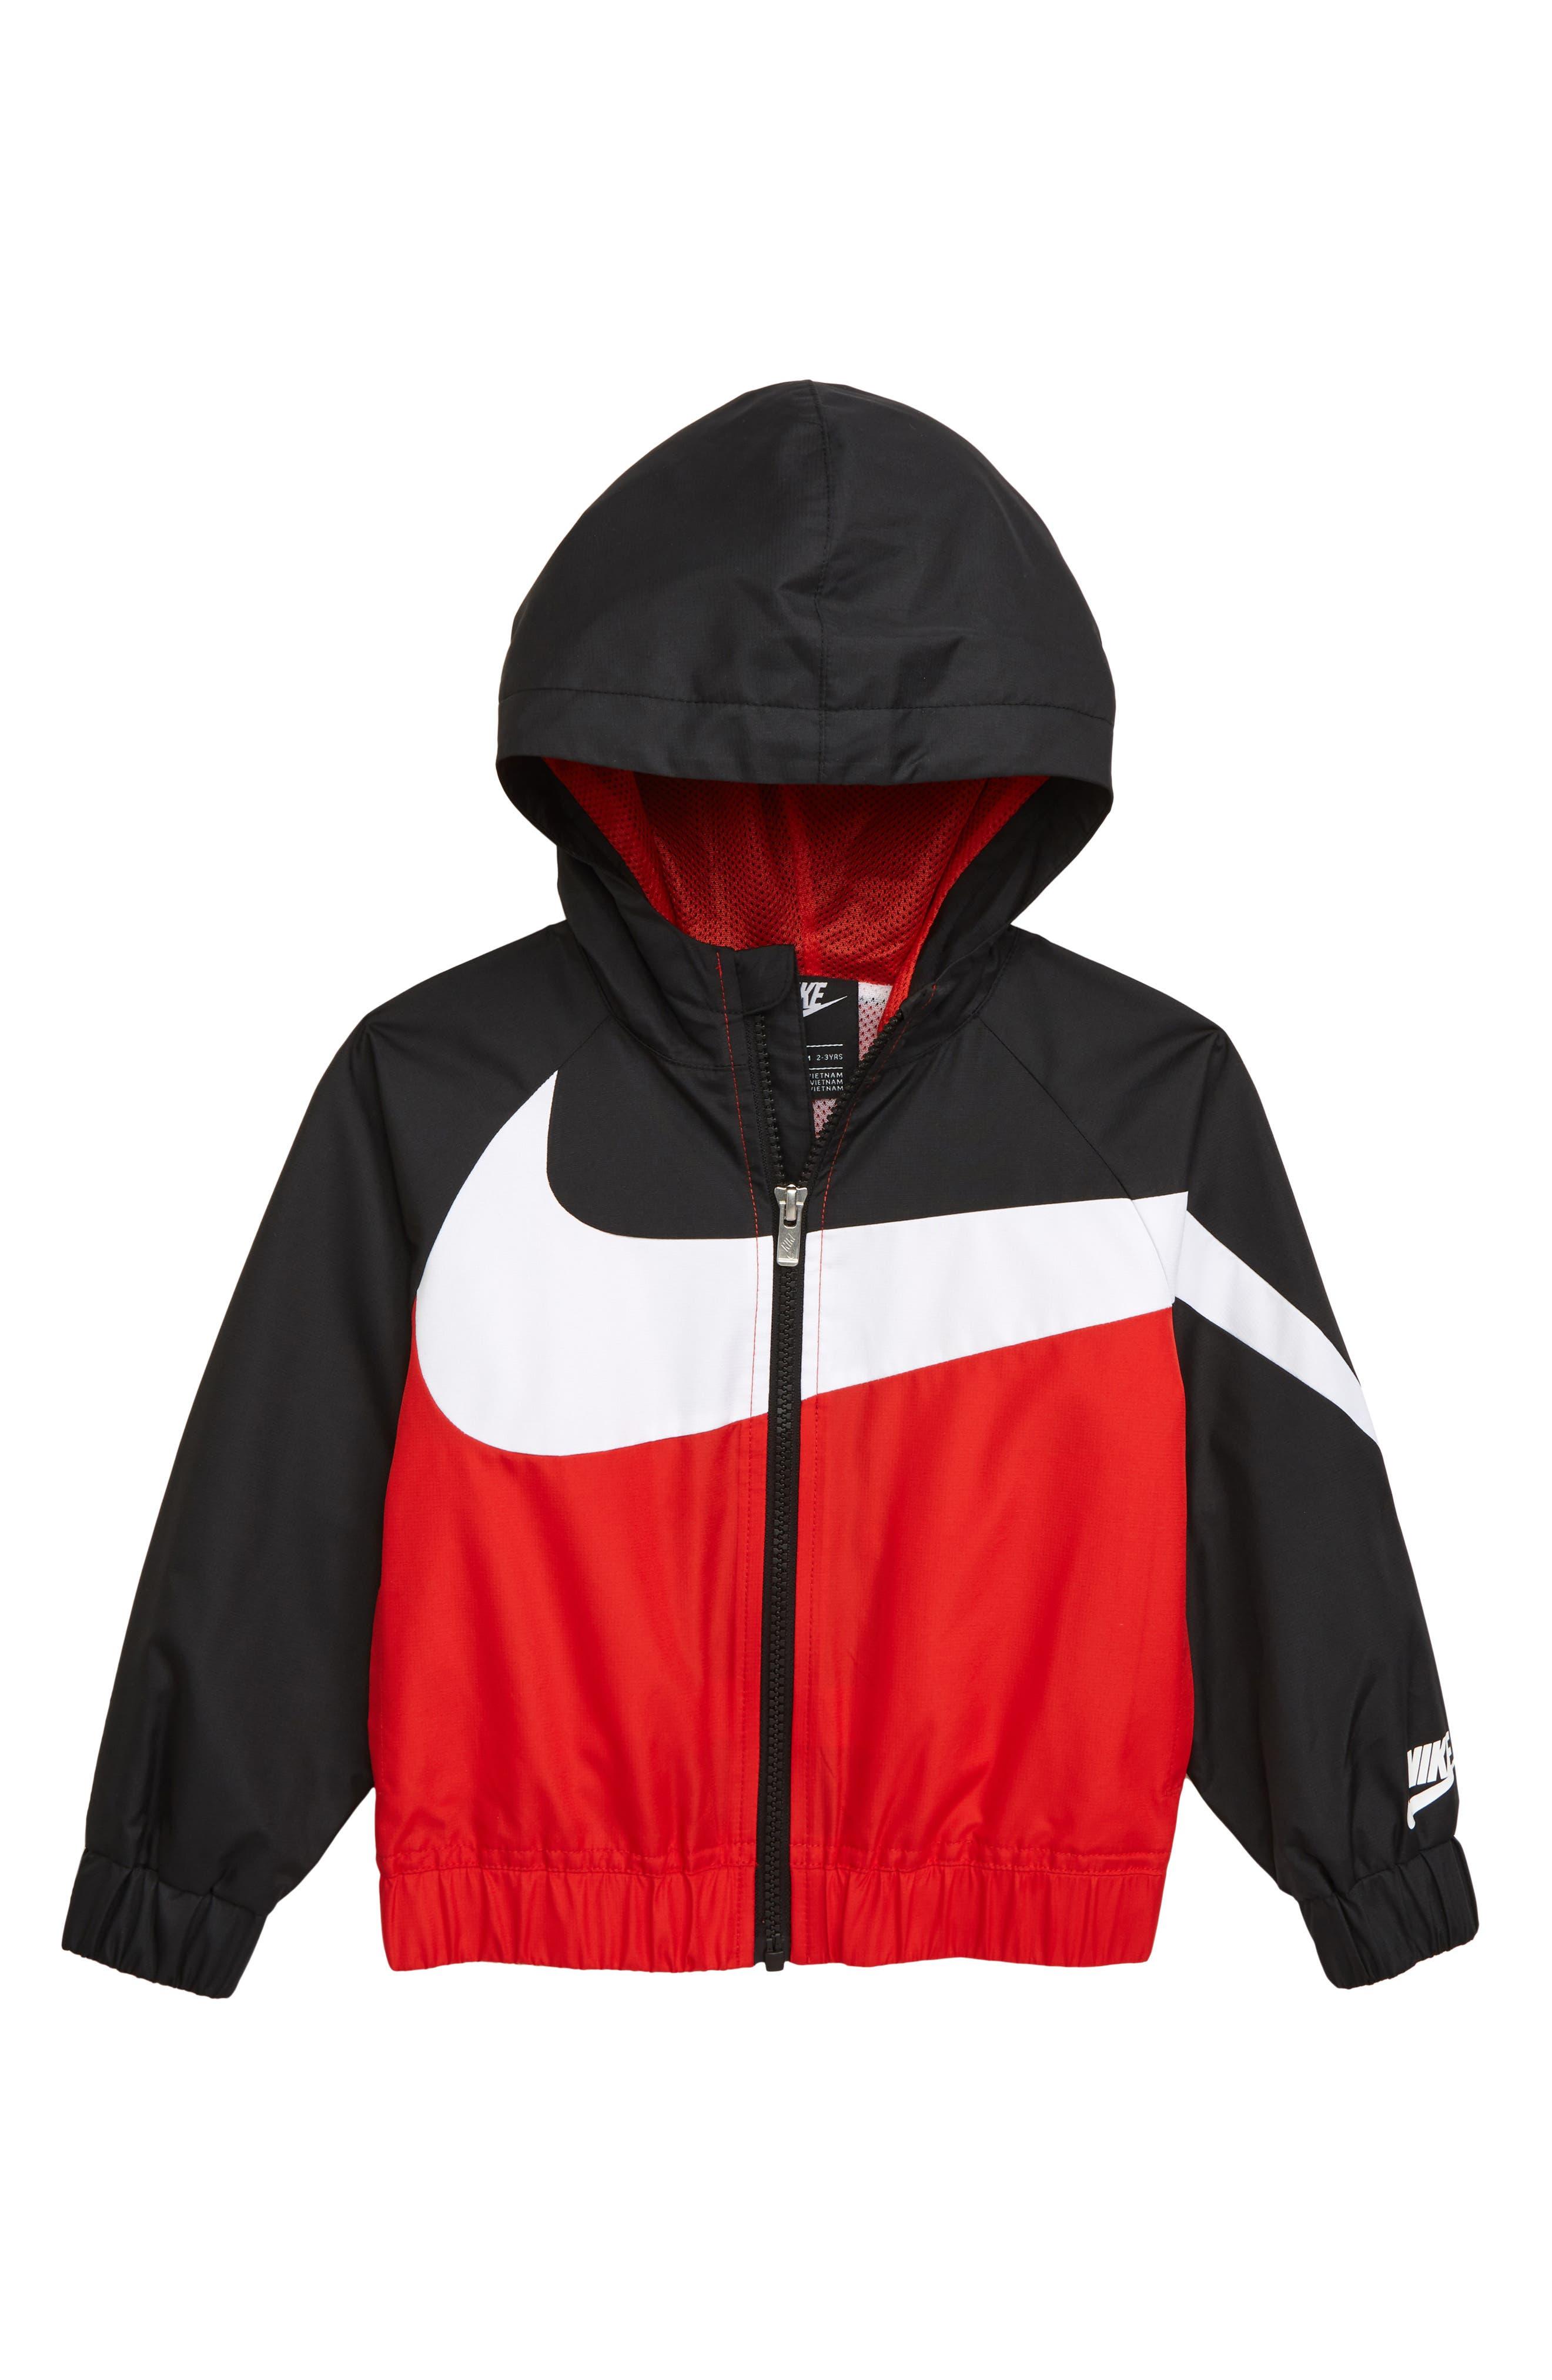 Boys Nike Oversize Windrunner Hooded Jacket Size 5  Red